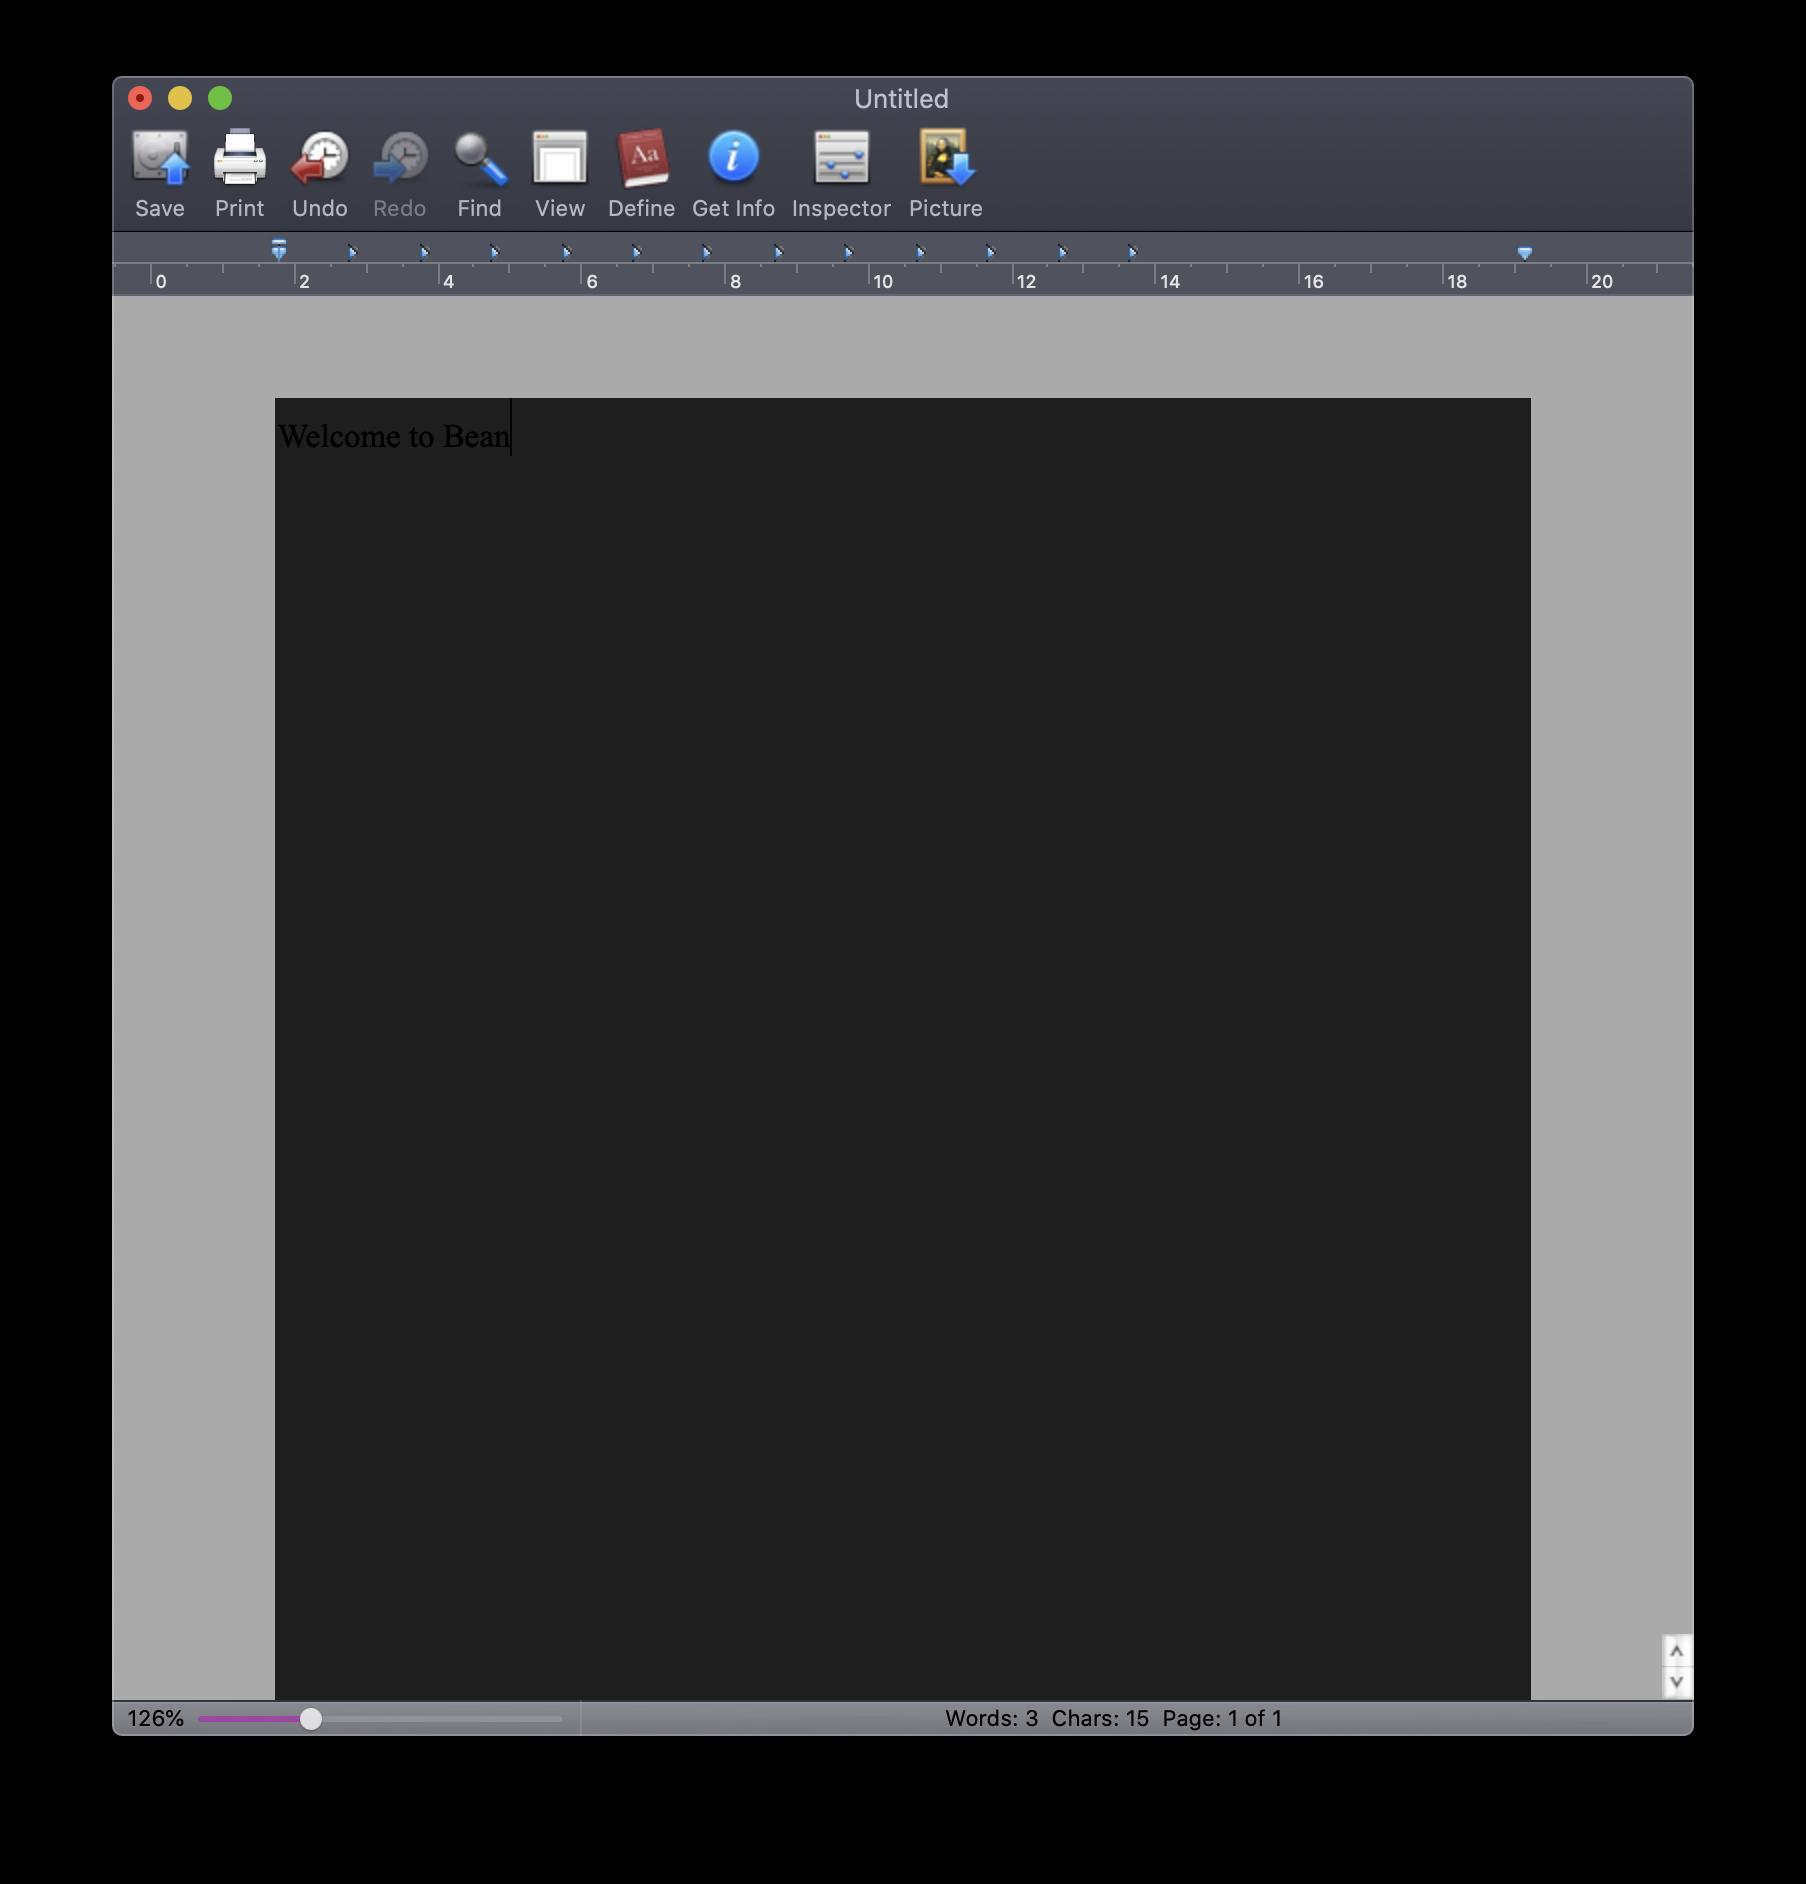 Bean 2.4.5 on macOS Catalina in dark mode